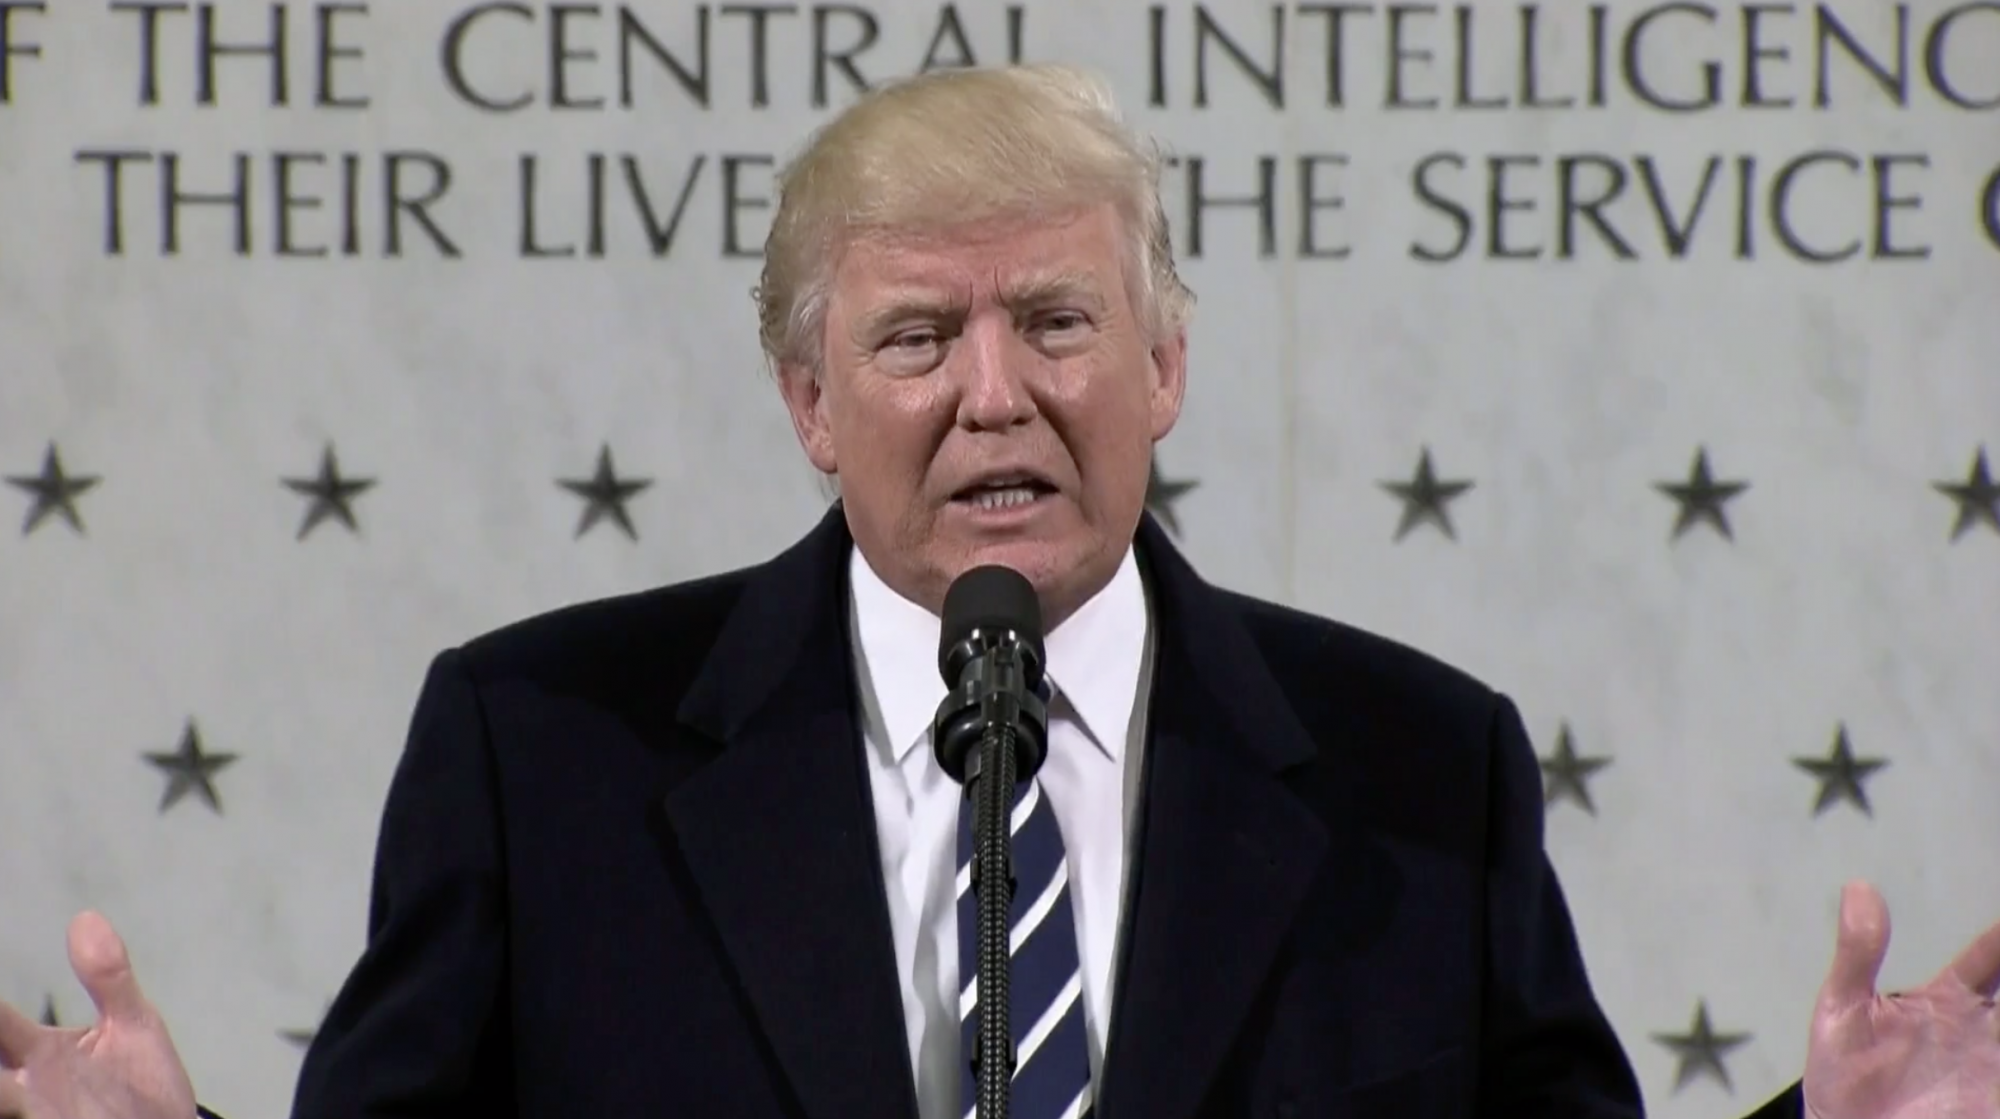 How has Trump's talk of 'fake news' undermined US democracy?